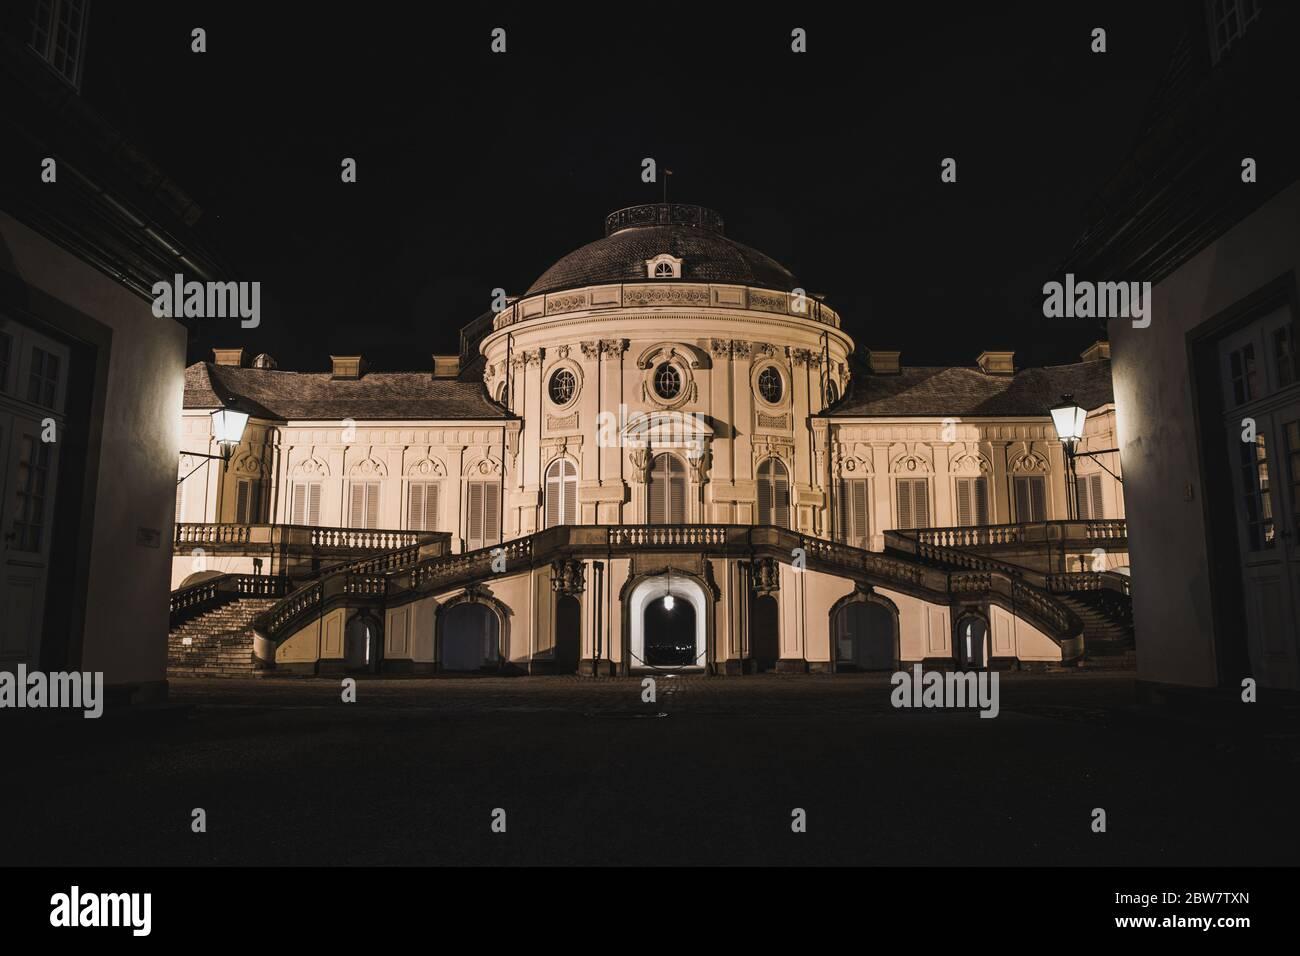 Schloss Solitude in Stuttgart, Deutschland, Baden-Wuerttemberg bei Nacht Stock Photo